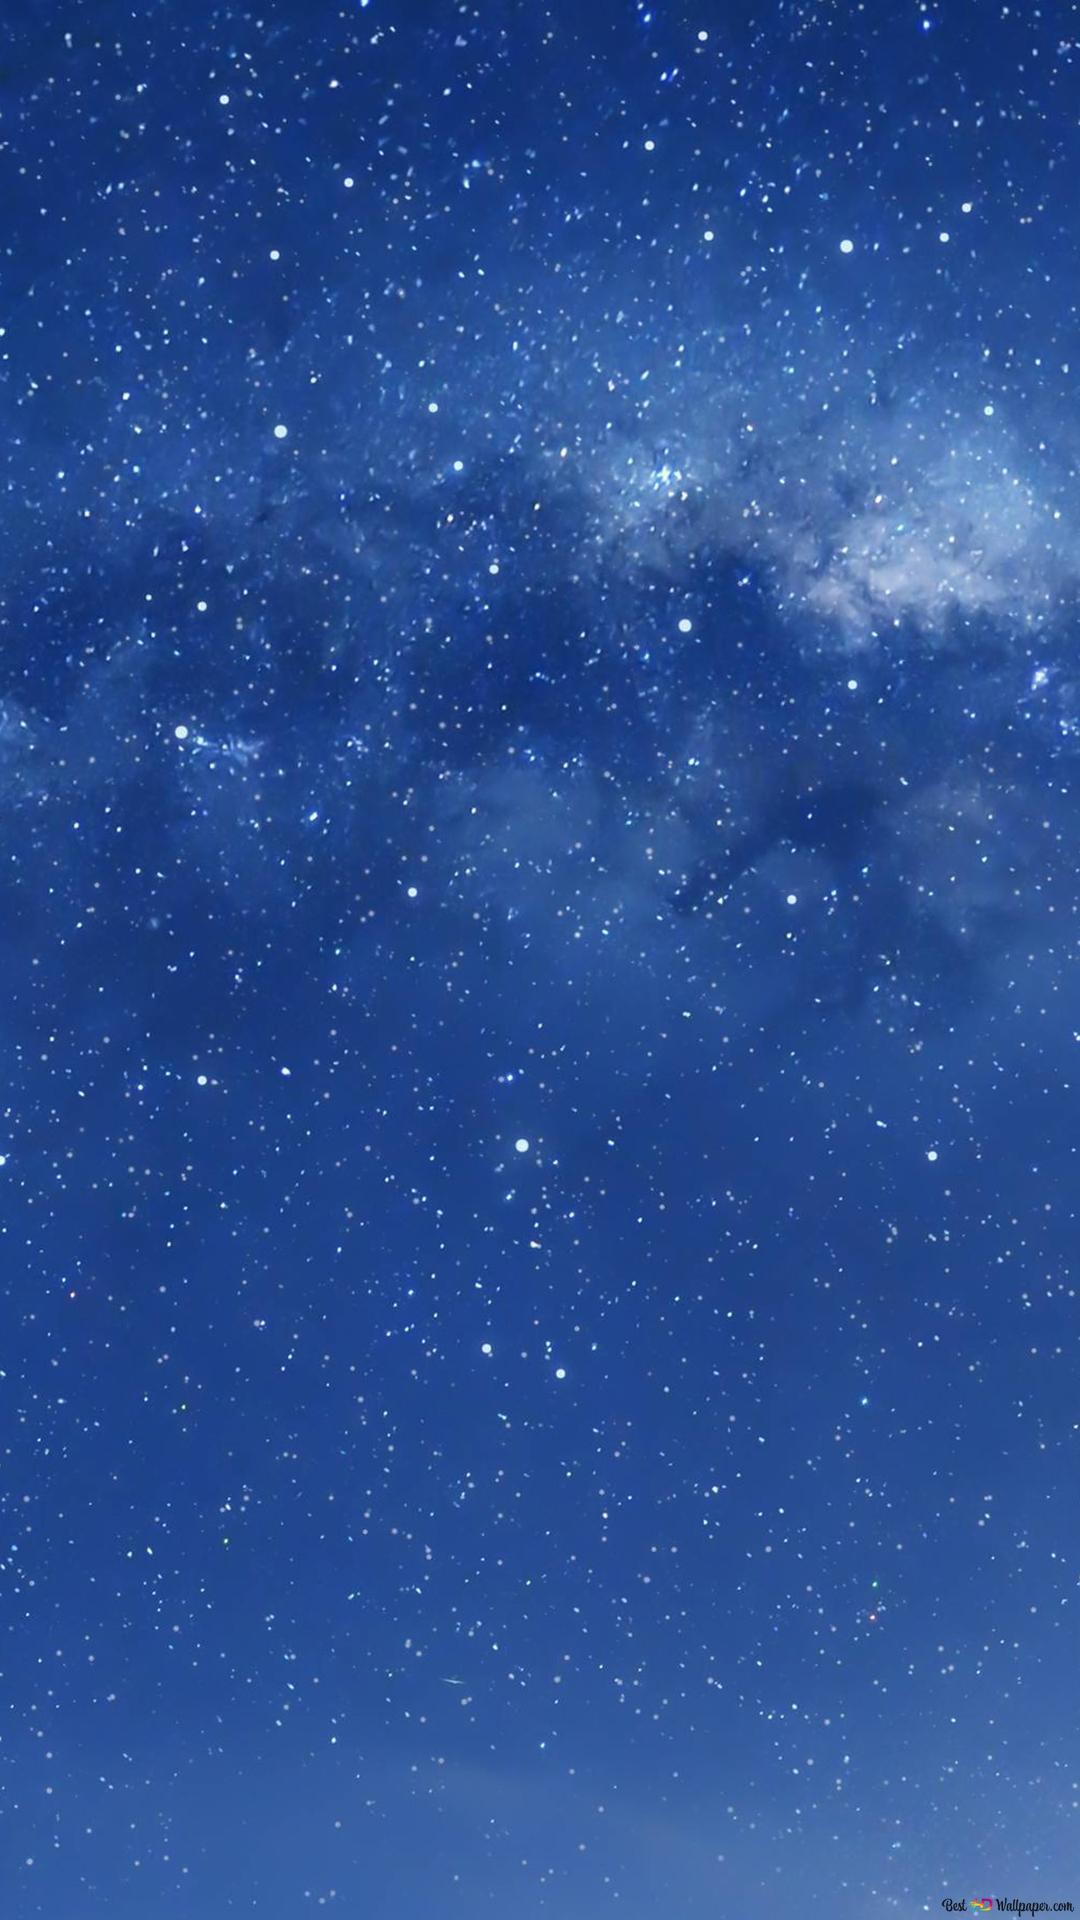 Lieblings Blue Sky Galaxy HD Hintergrundbilder herunterladen #KN_21